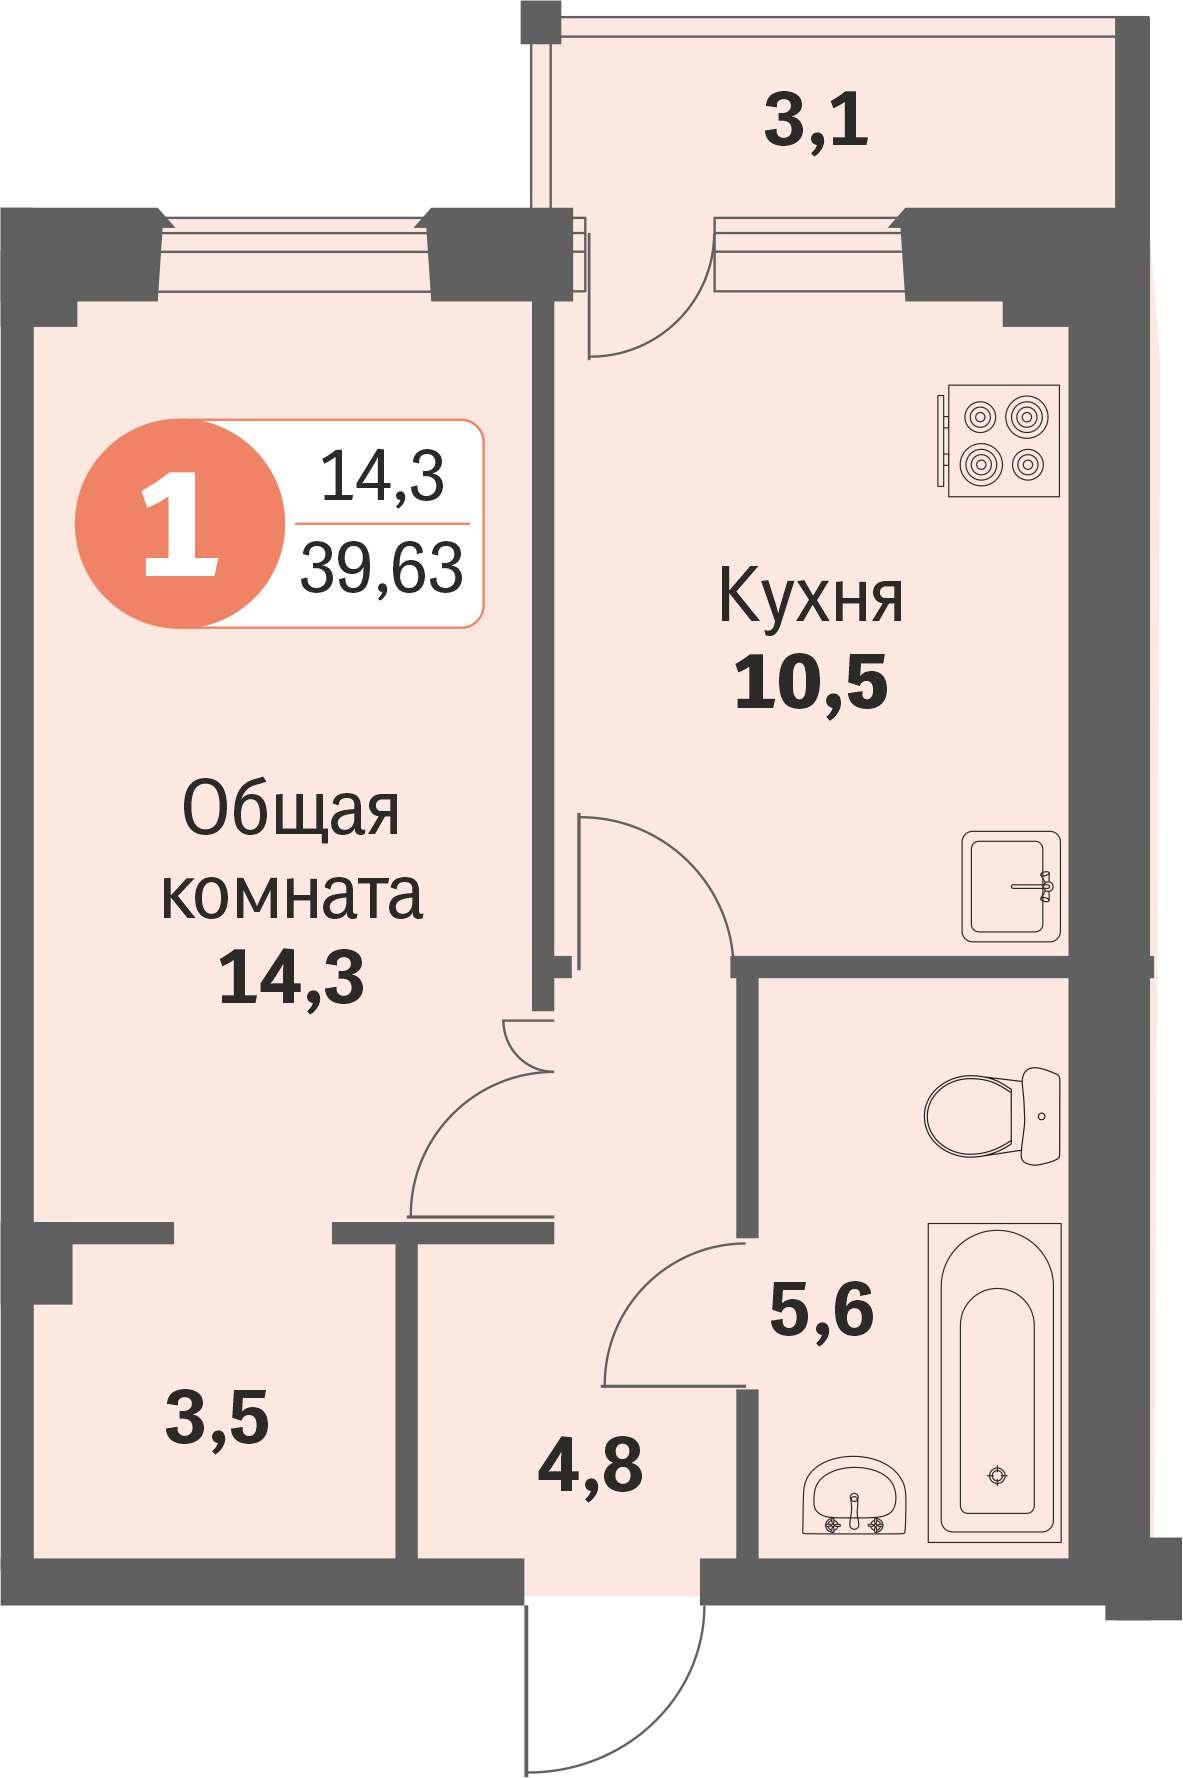 ул. Свиридова, 14, квартира 506 - Однокомнатная